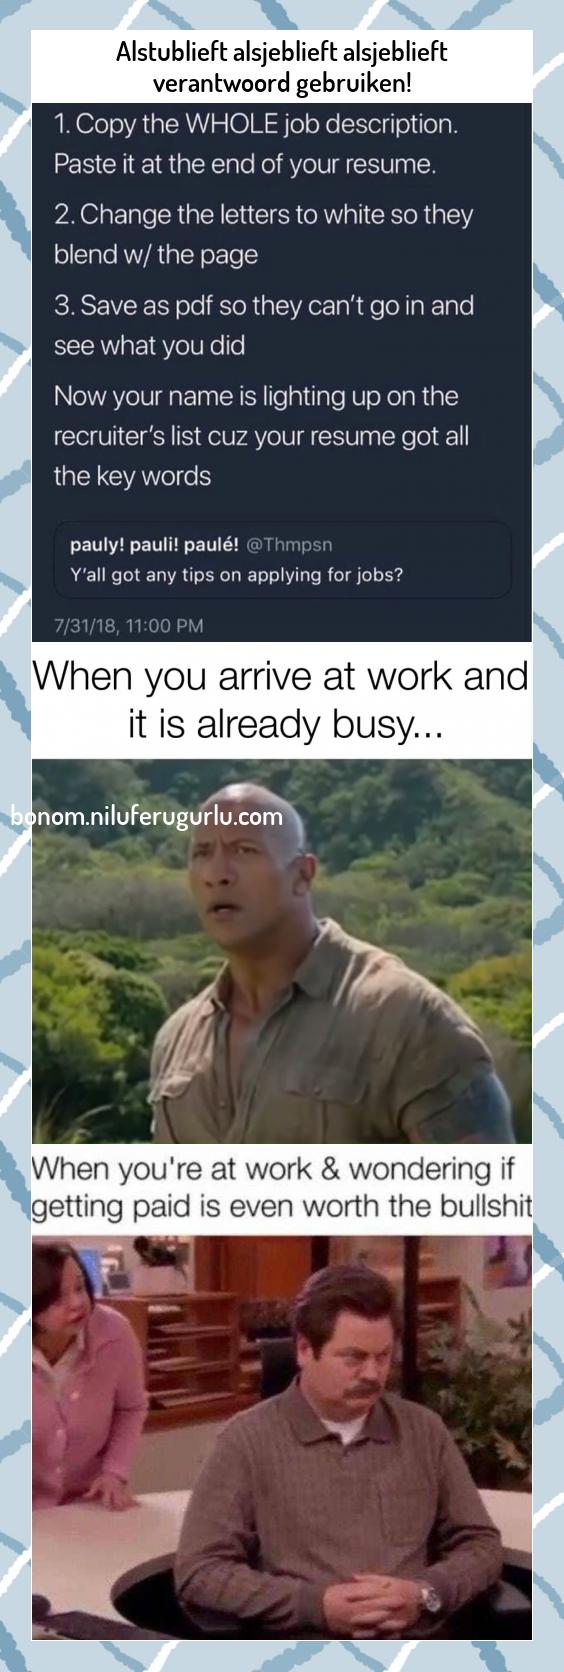 Alstublieft Alsjeblieft Alsjeblieft Verantwoord Gebruiken Alstublieft Alsjeblieft Alsjeblieft Verantwoord In 2020 Funny Memes About Work Ecards Funny Funny Memes